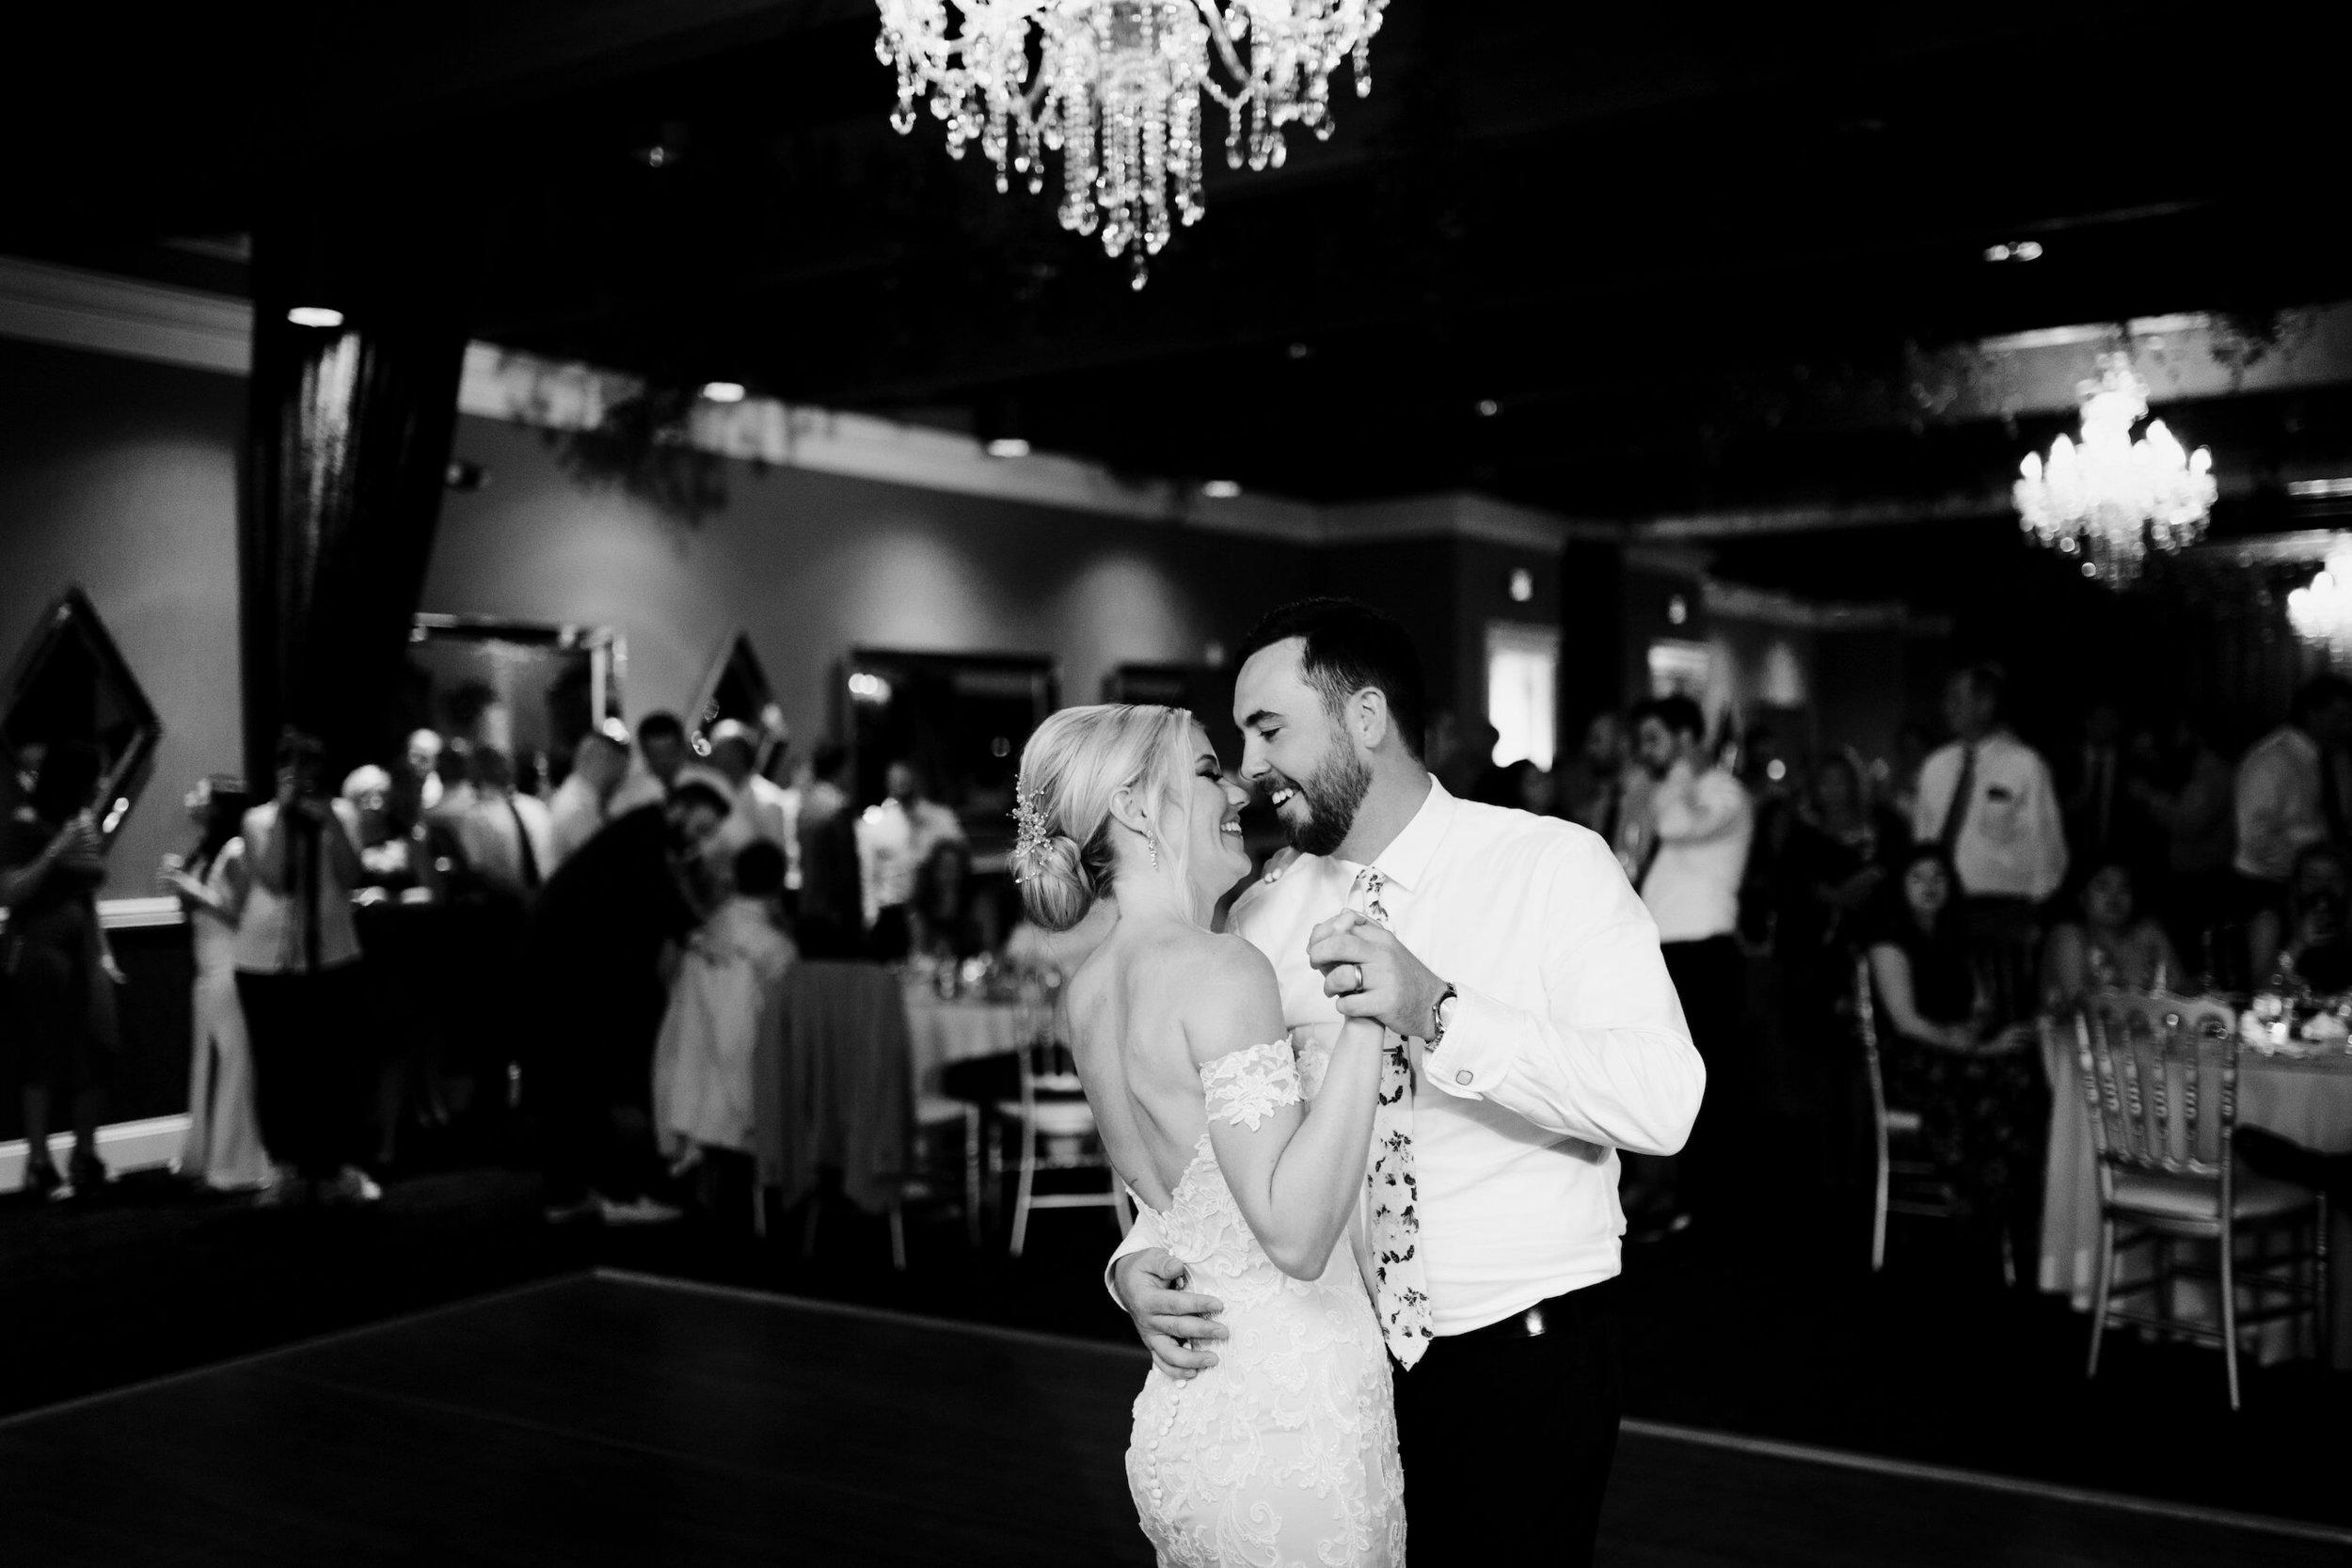 engle-olson-april-cj-wedding-jessica-holleque-20.jpg